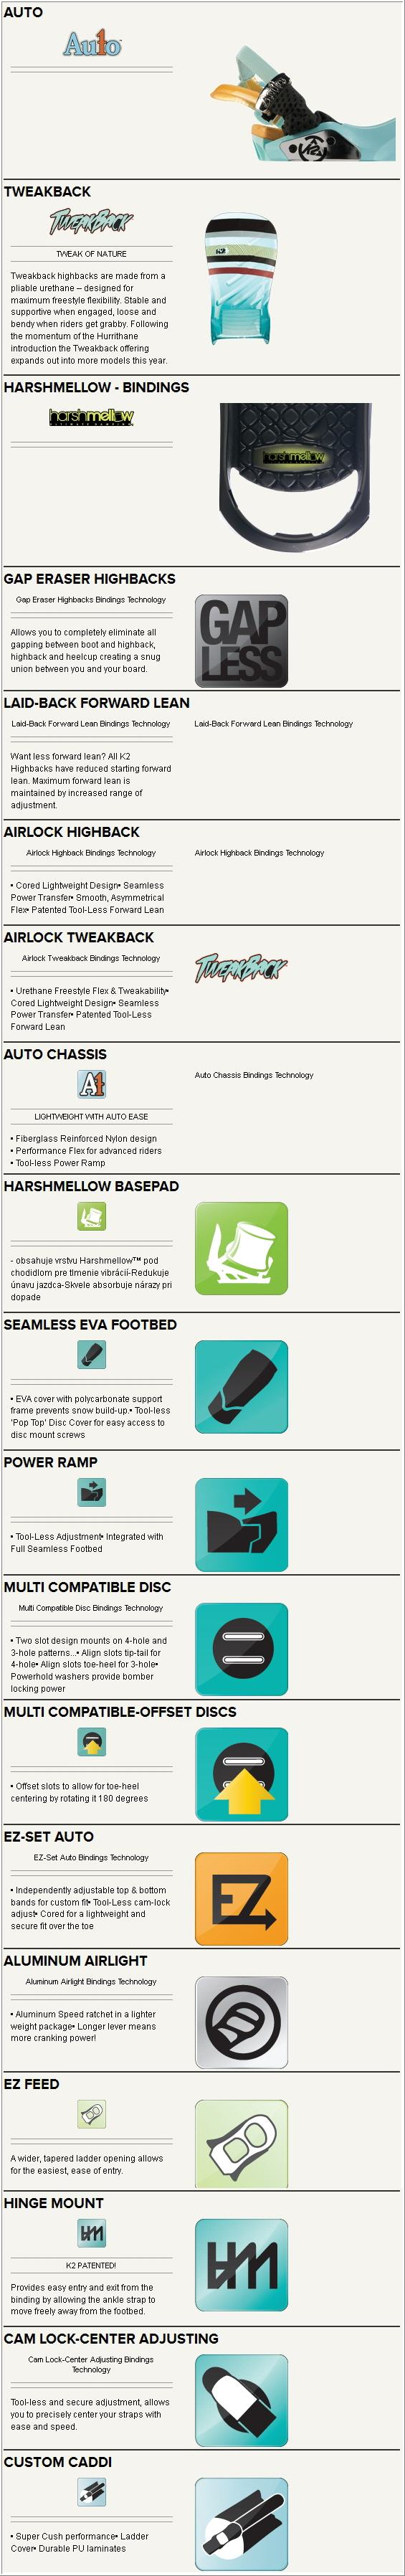 K2 NATIONAL 2012 TECNOLOGY